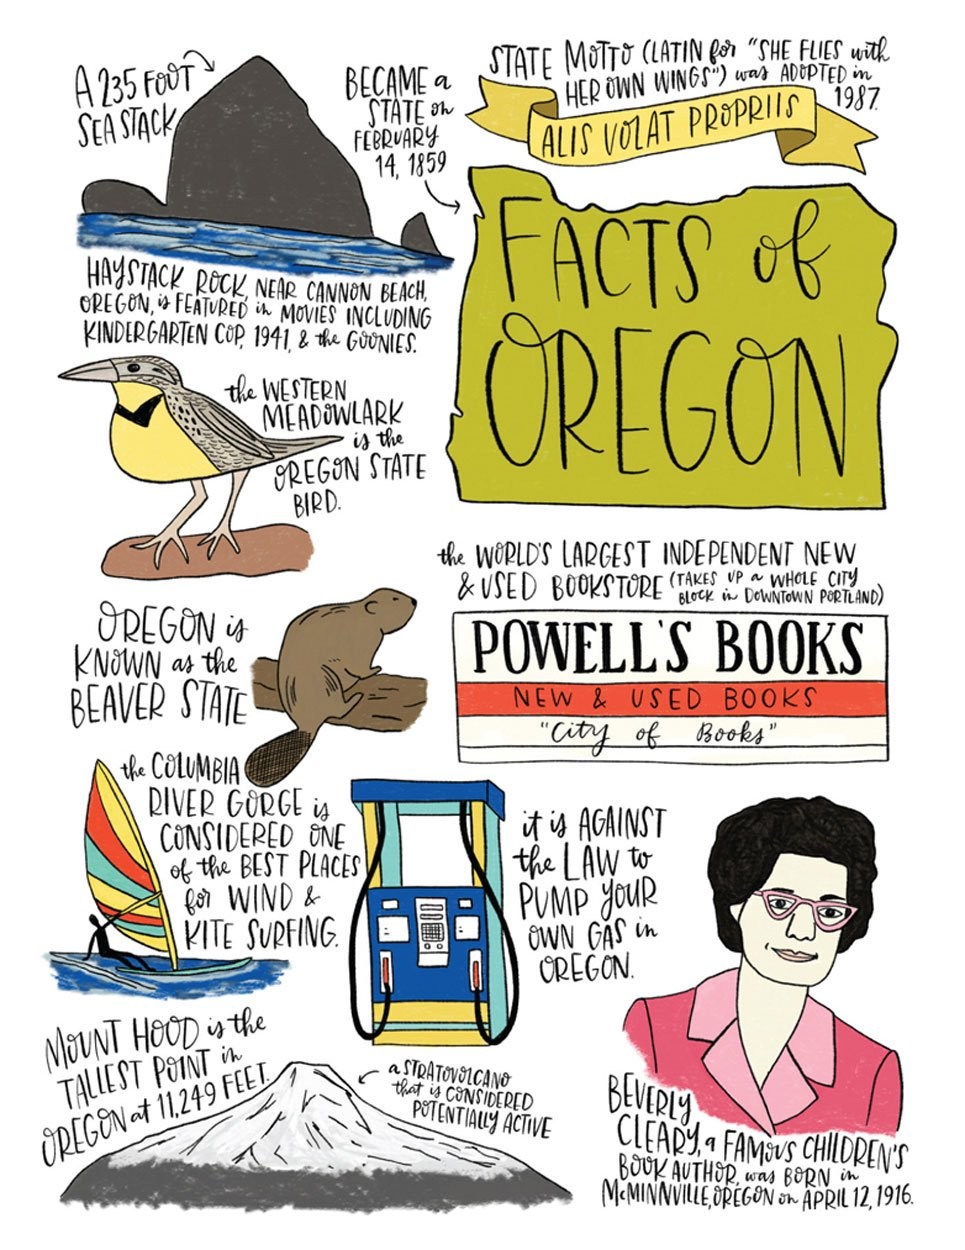 Oregon Estado hechos cocina toalla - 100% algodón toalla de cocina plato: Amazon.es: Hogar